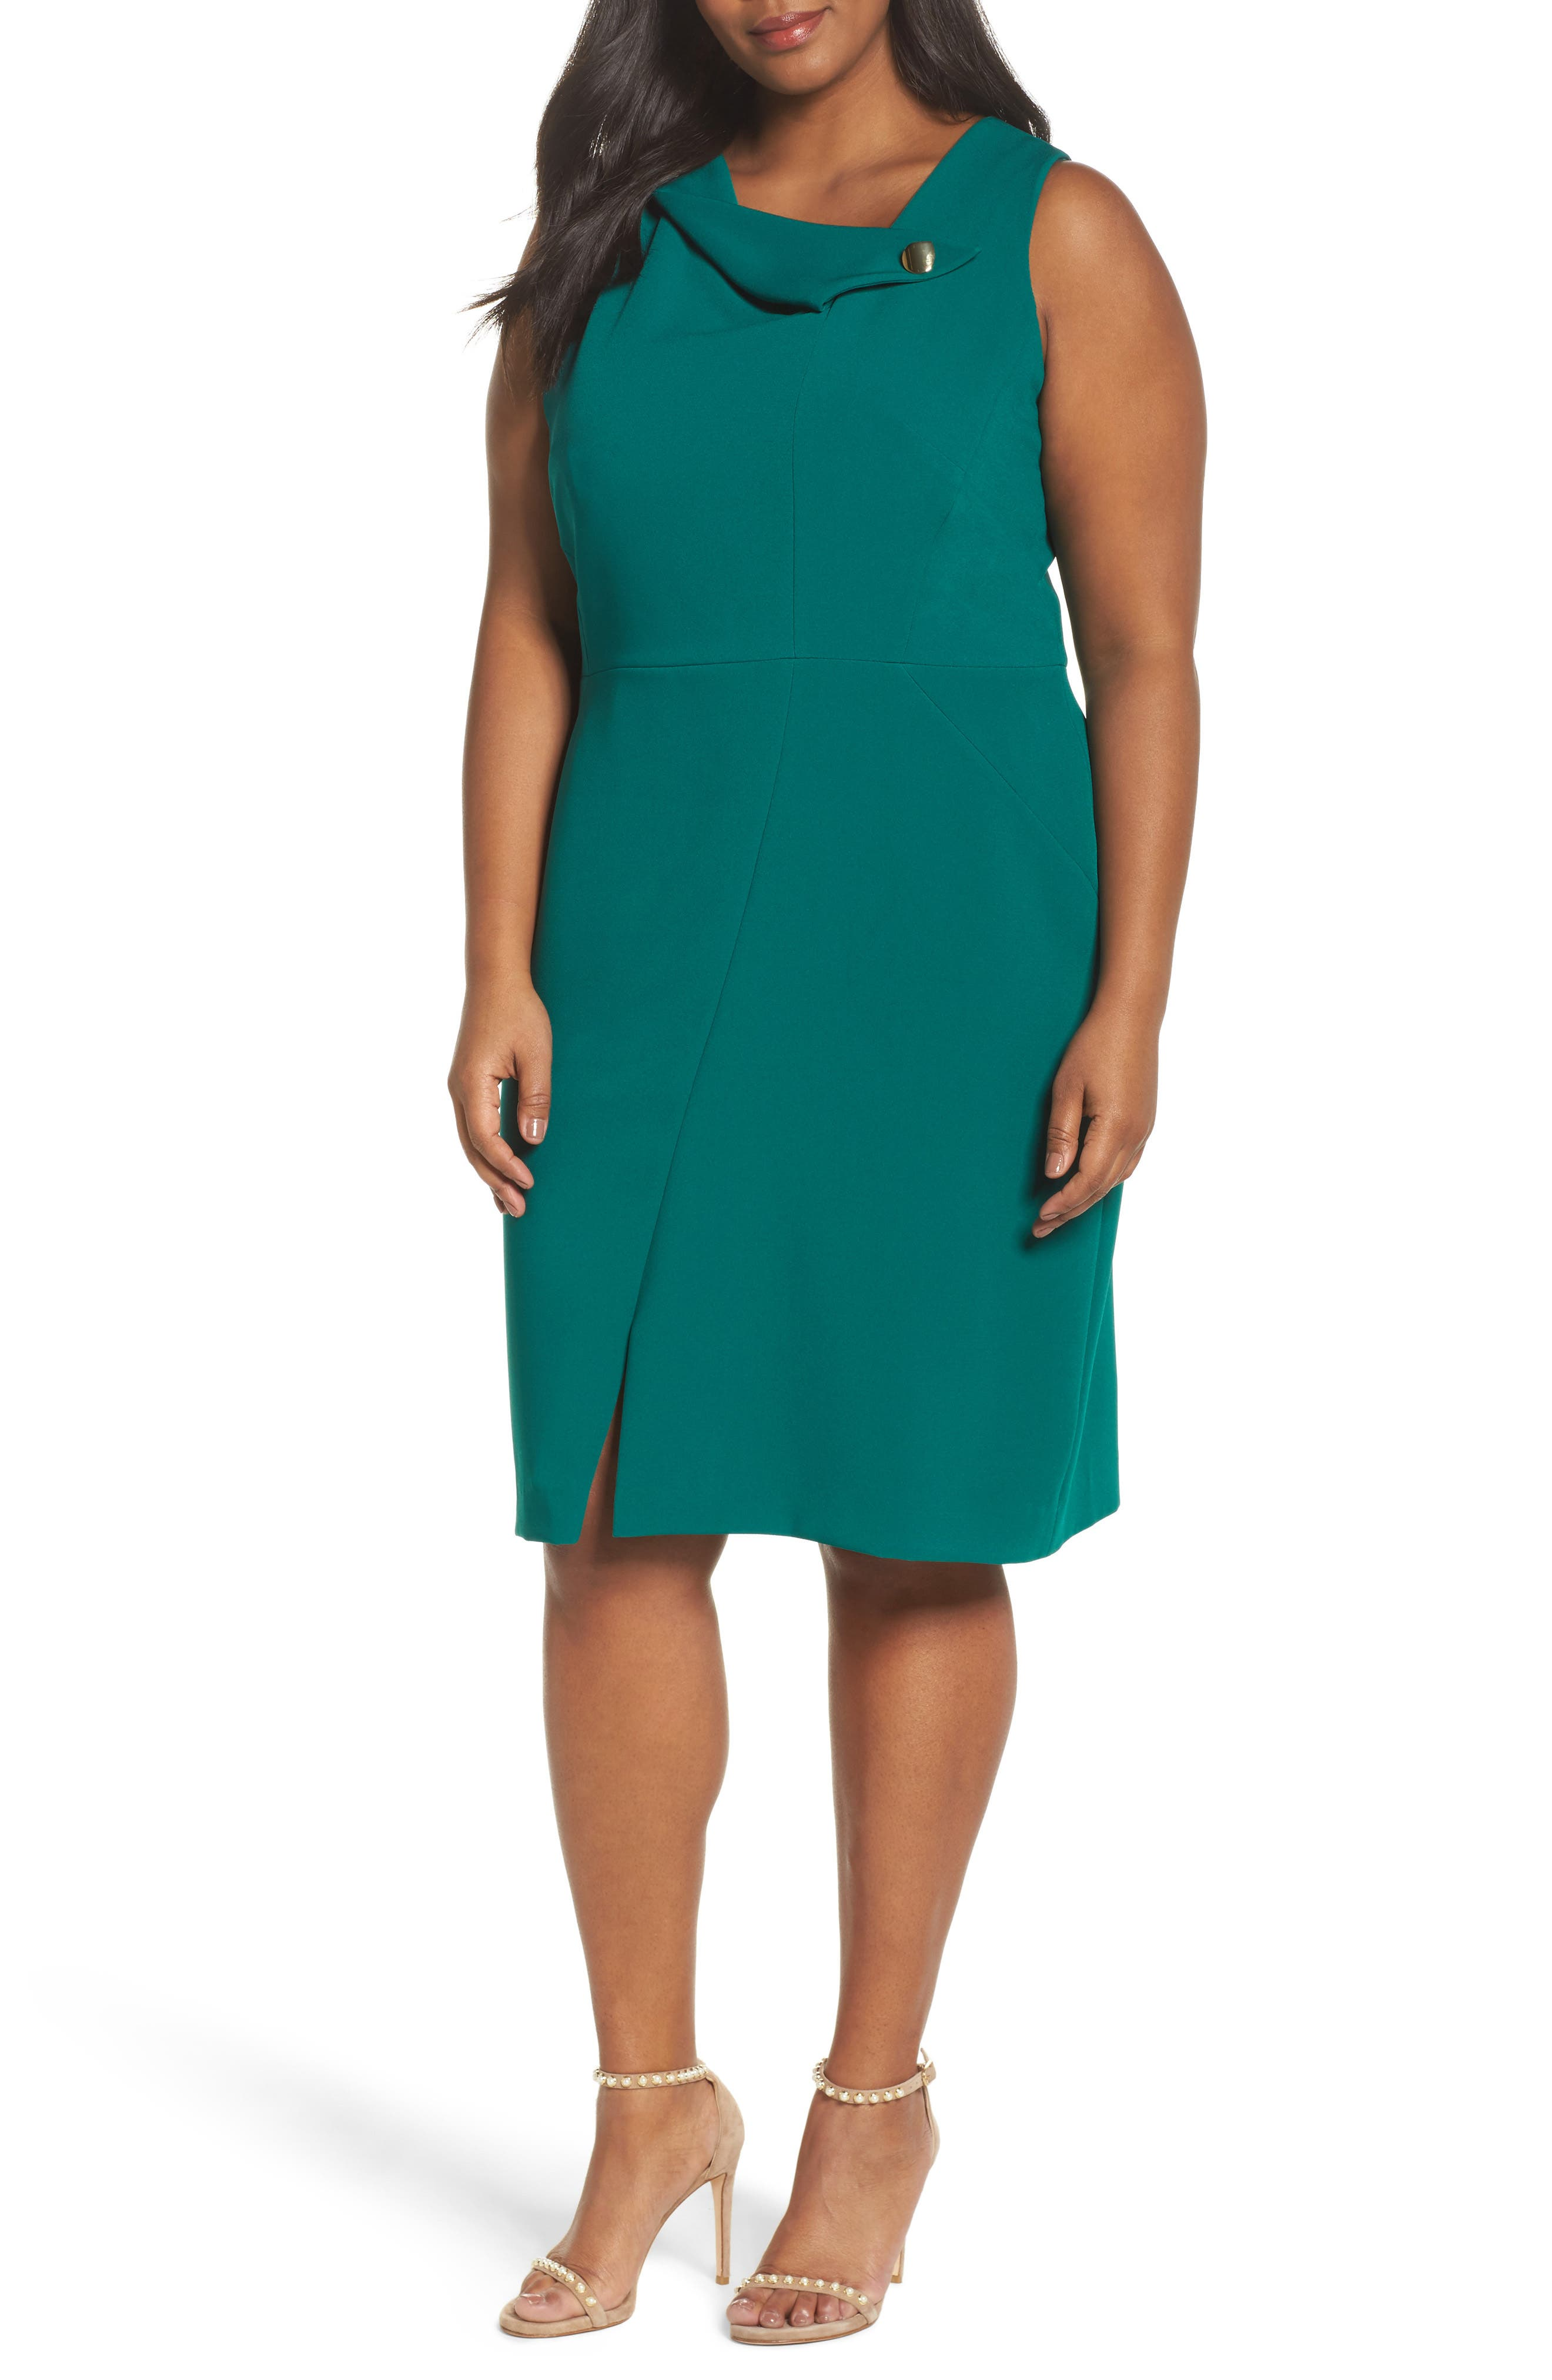 Tahari Envelope Neck with Button Sheath Dress (Plus Size)